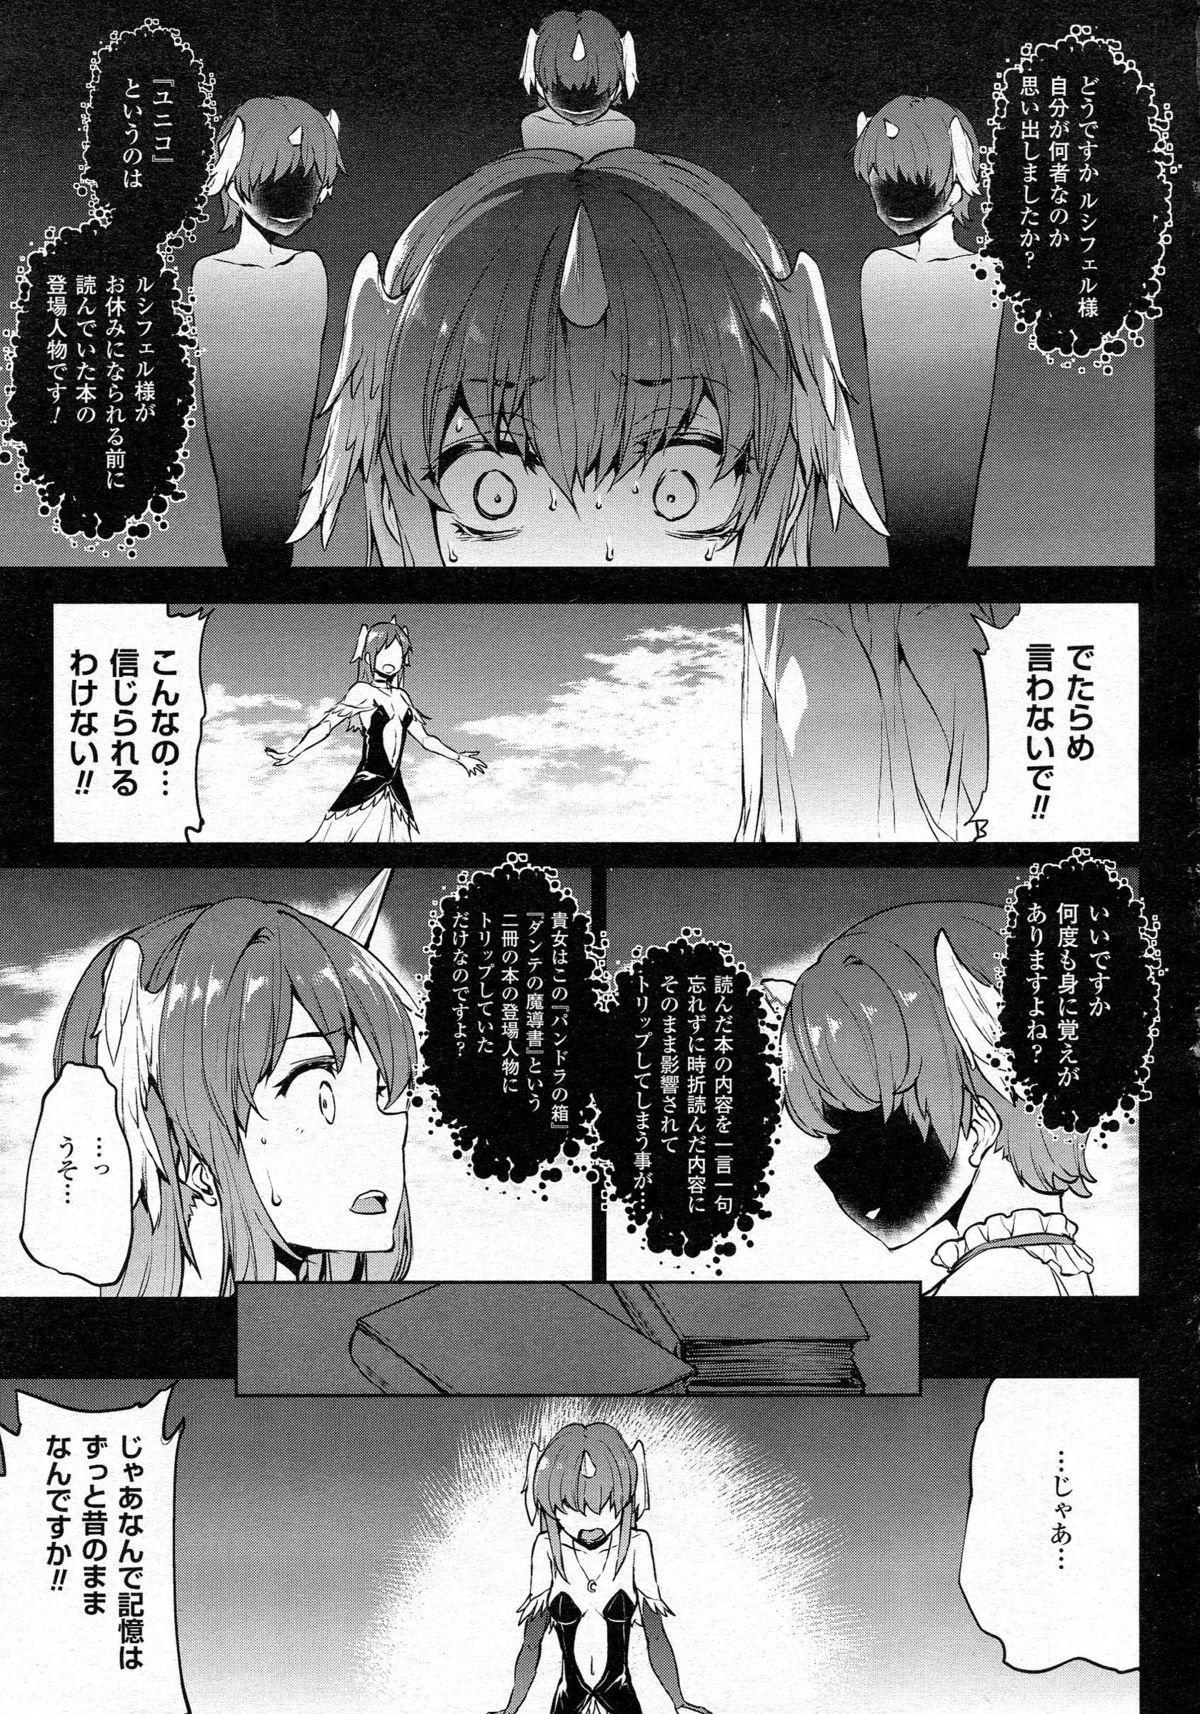 COMIC Unreal 2015-06 Vol. 55 + Hisasi Illust Shuu 43